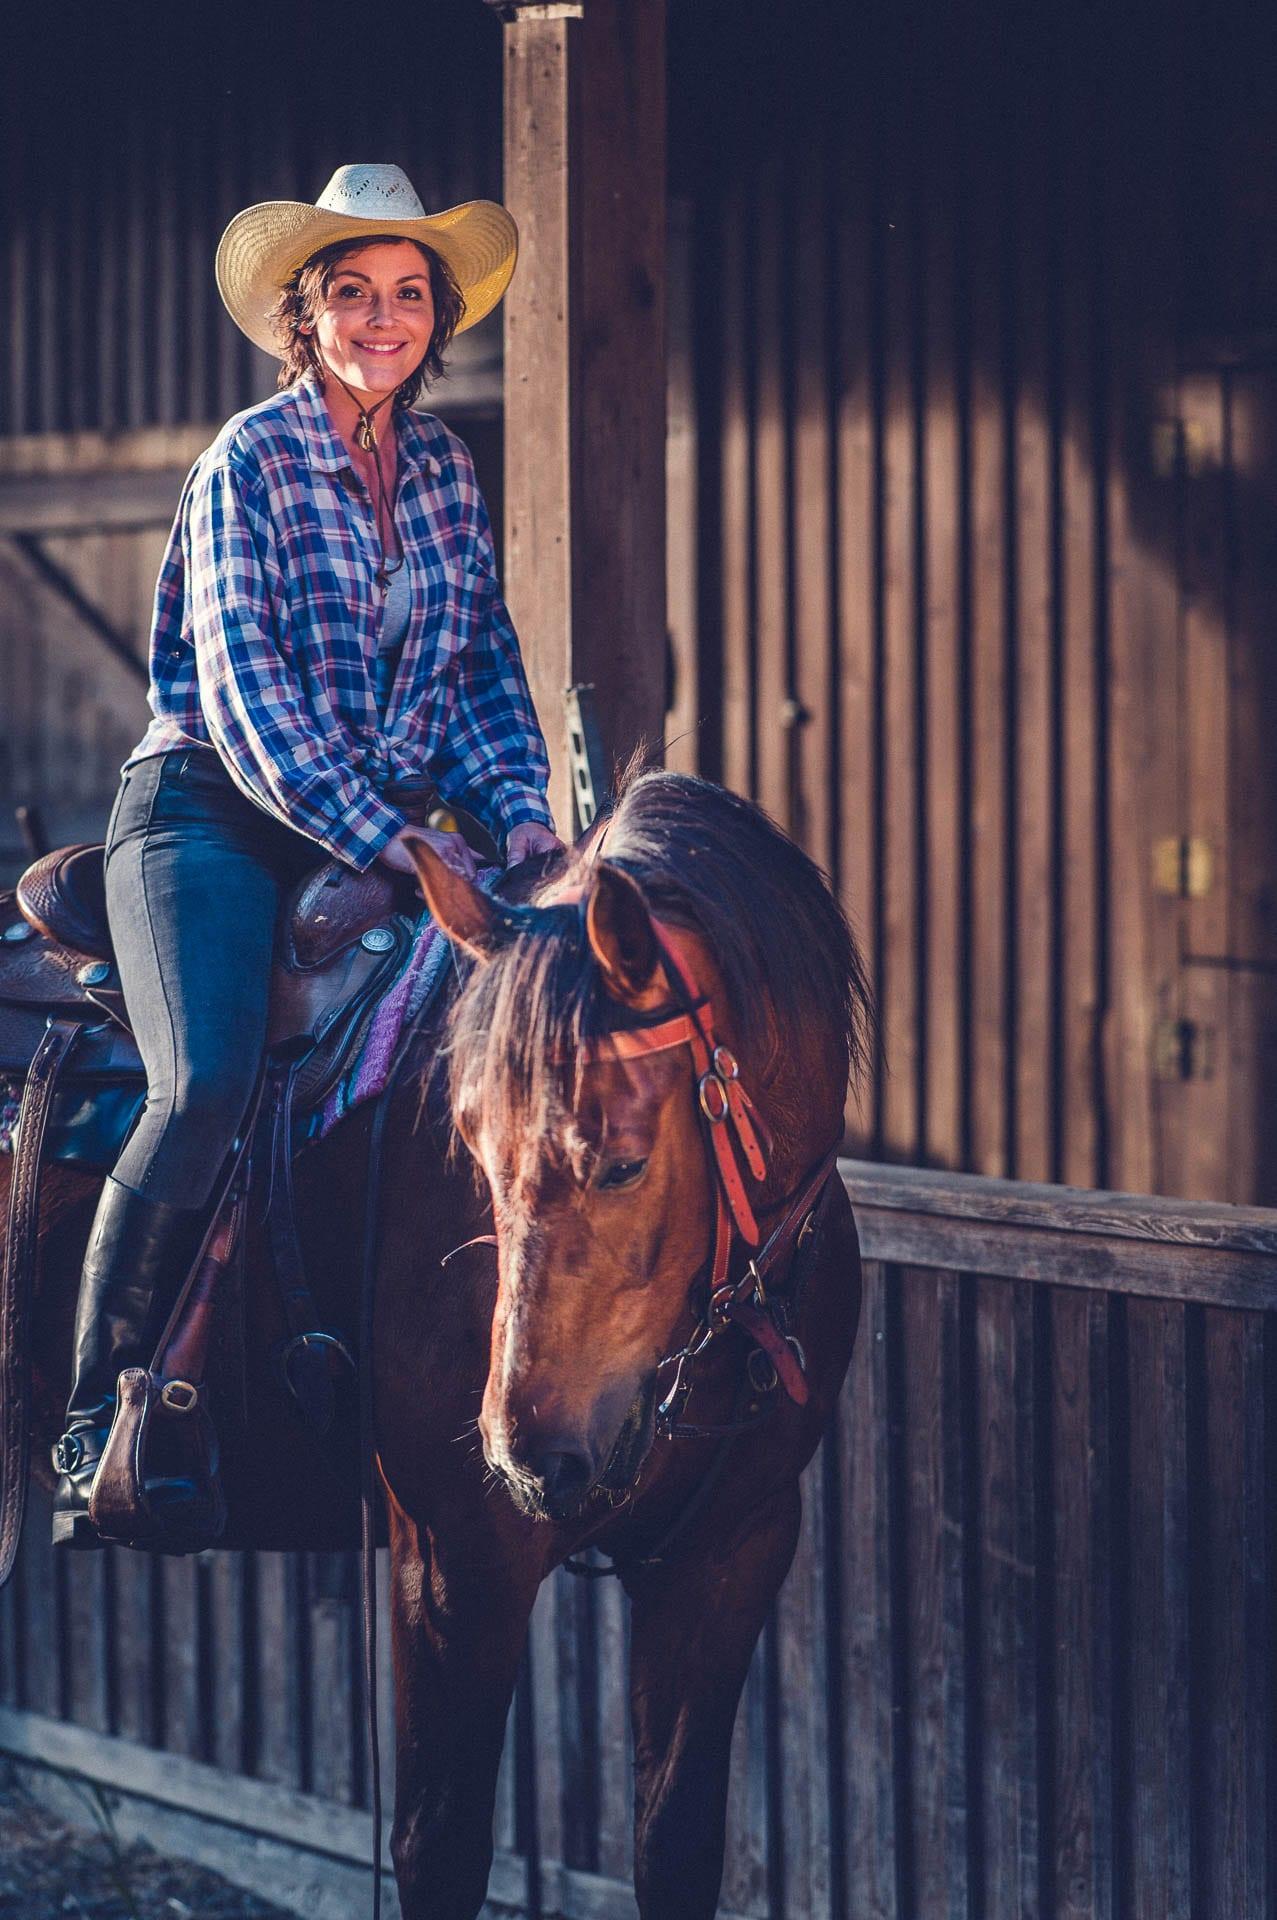 AF_Ranch_Pferdefotografie_200606_GZ6_6741